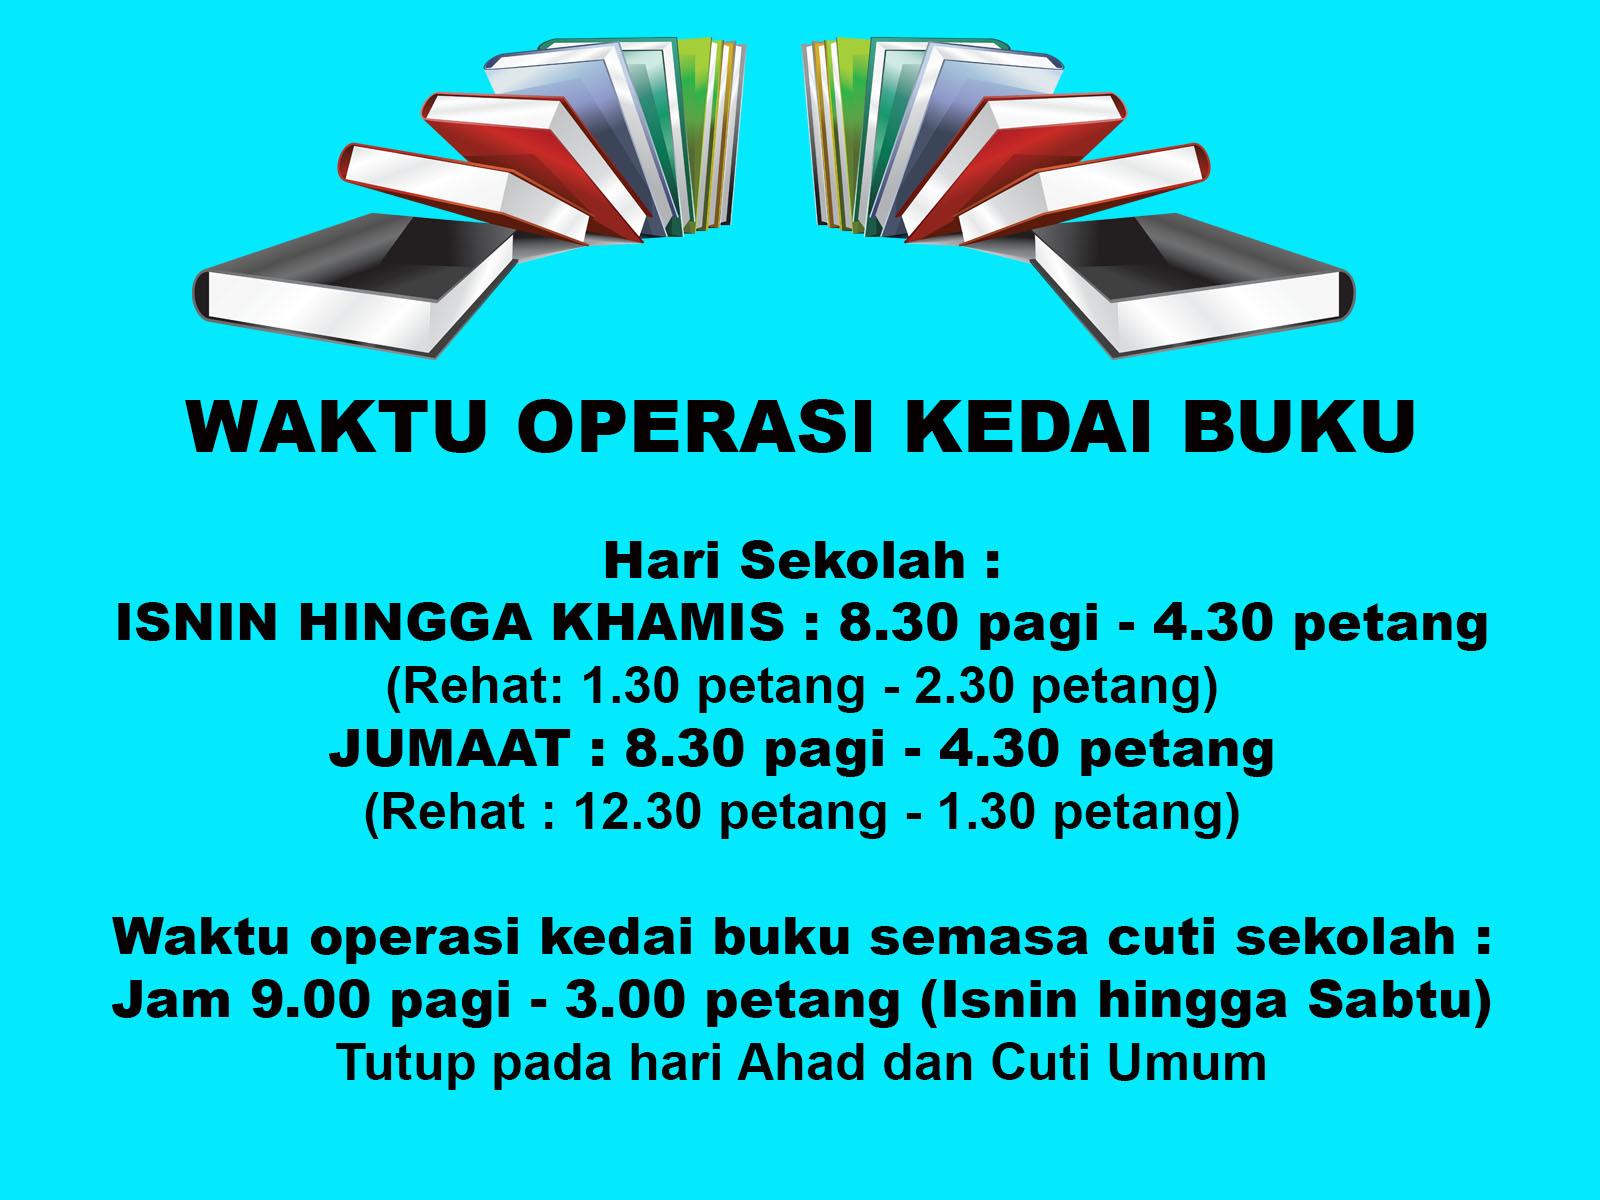 Waktu Operasi Kedai Buku